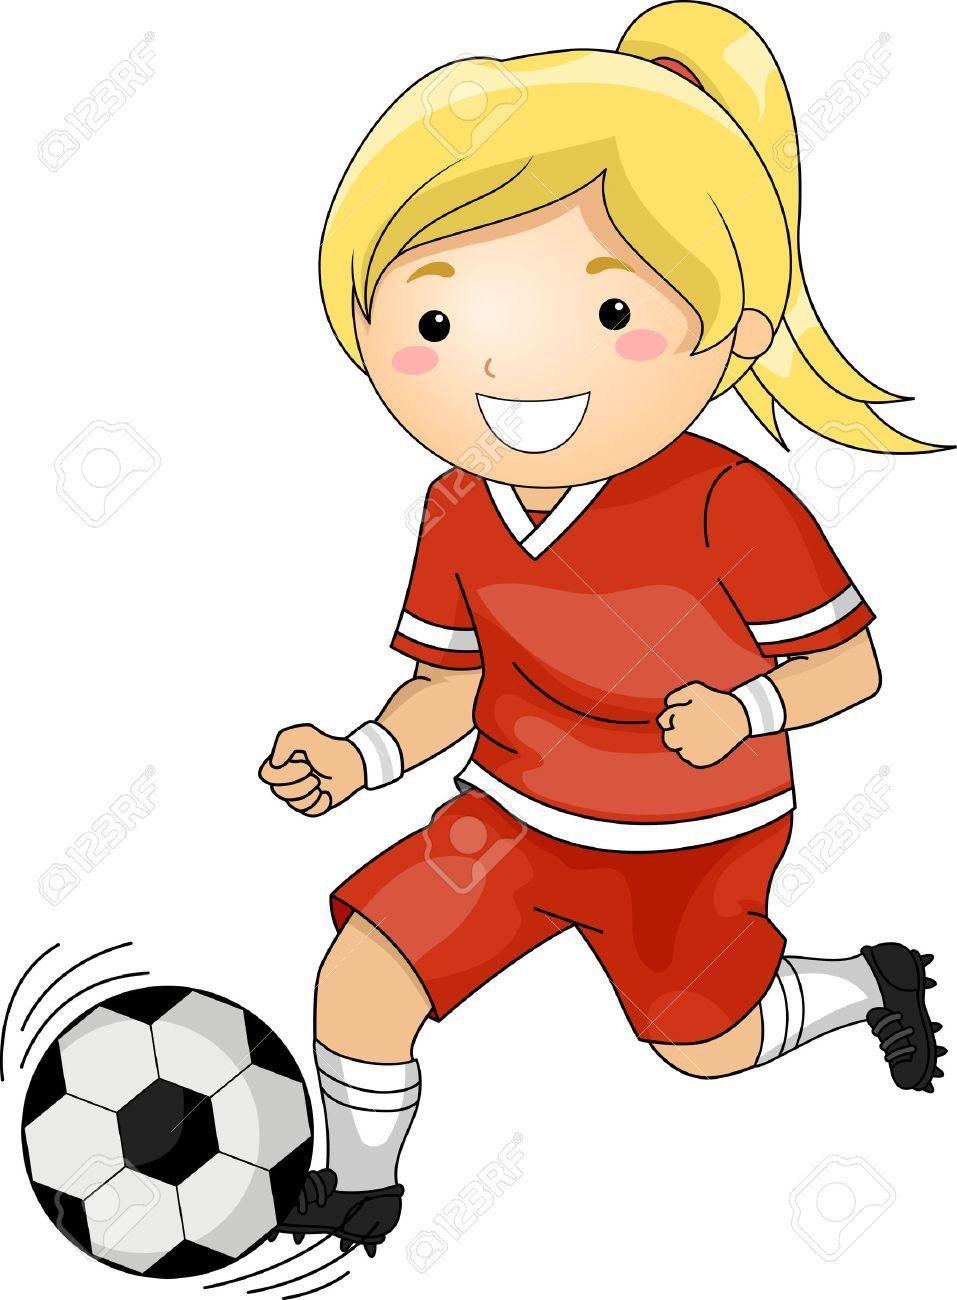 Girl soccer player clipart 5 » Clipart Portal.